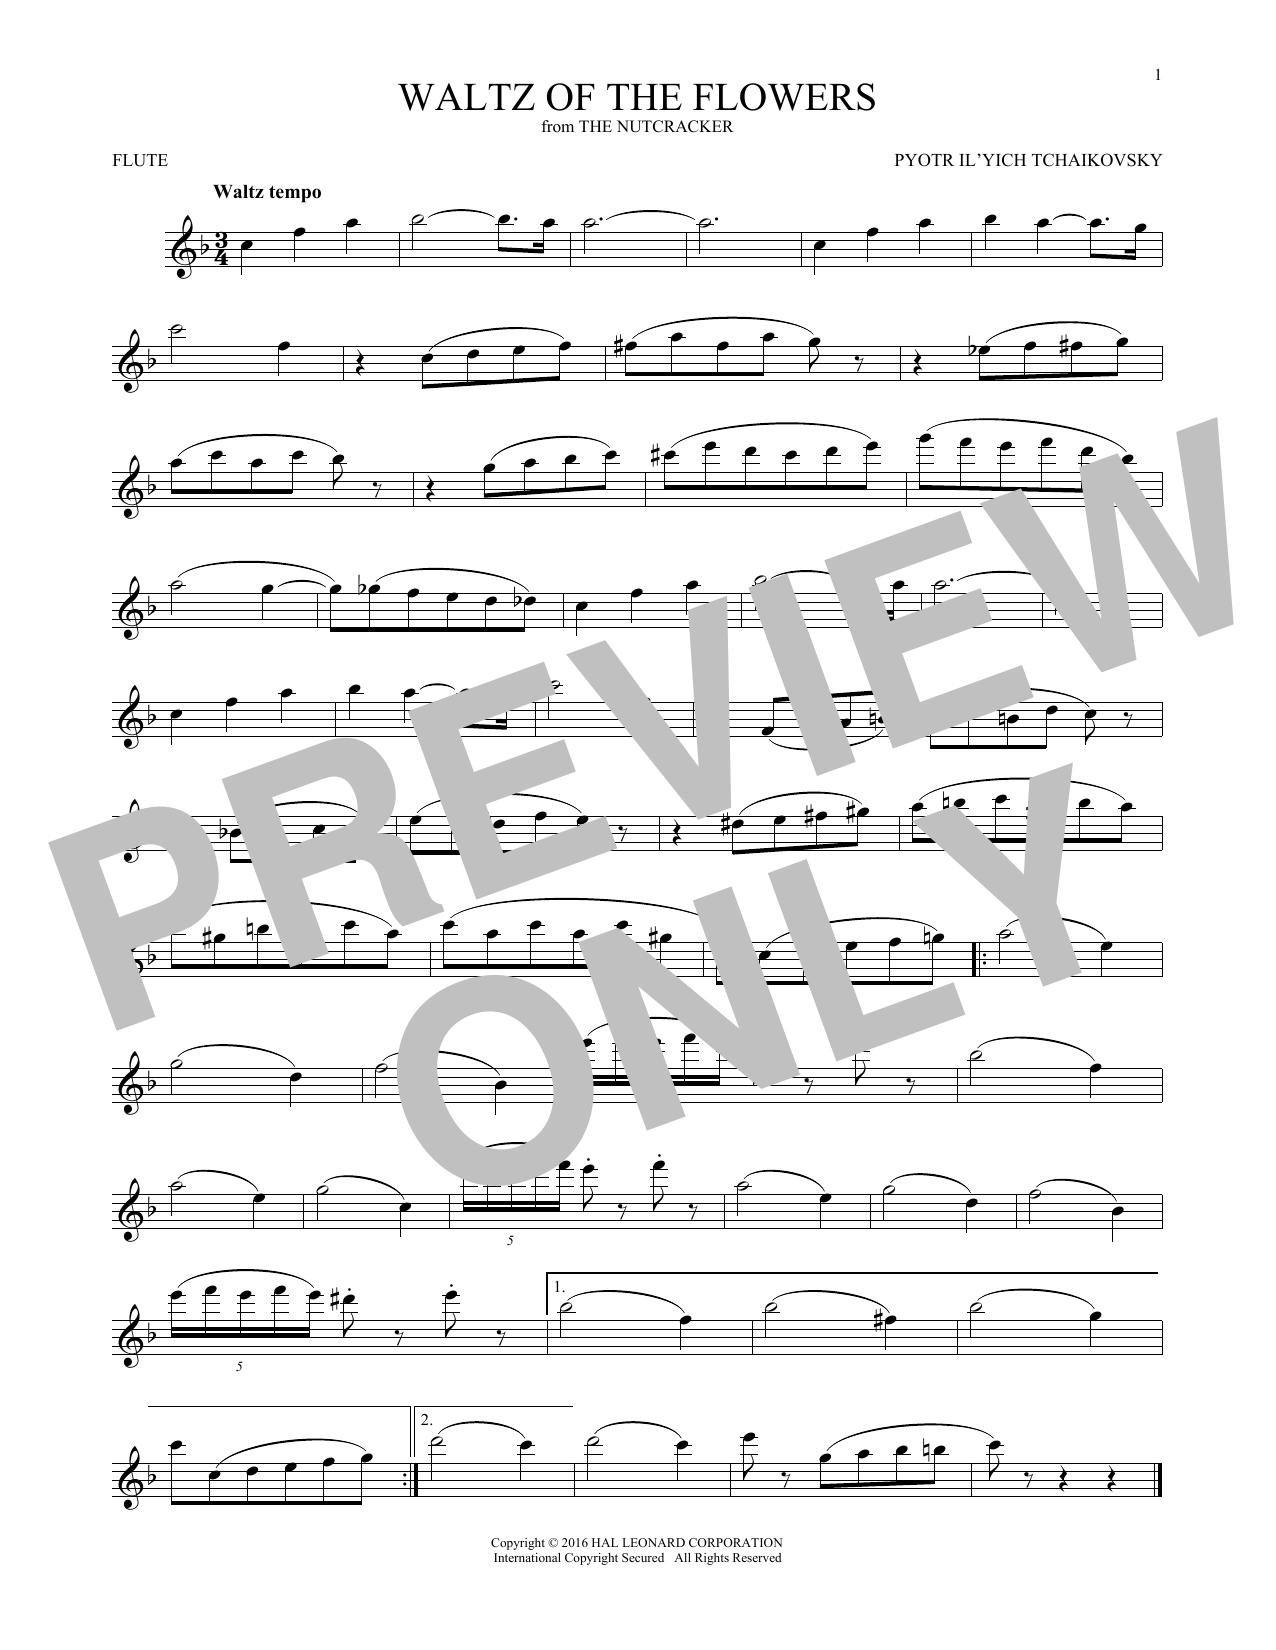 Waltz Of The Flowers, Op. 71a (Flute Solo)